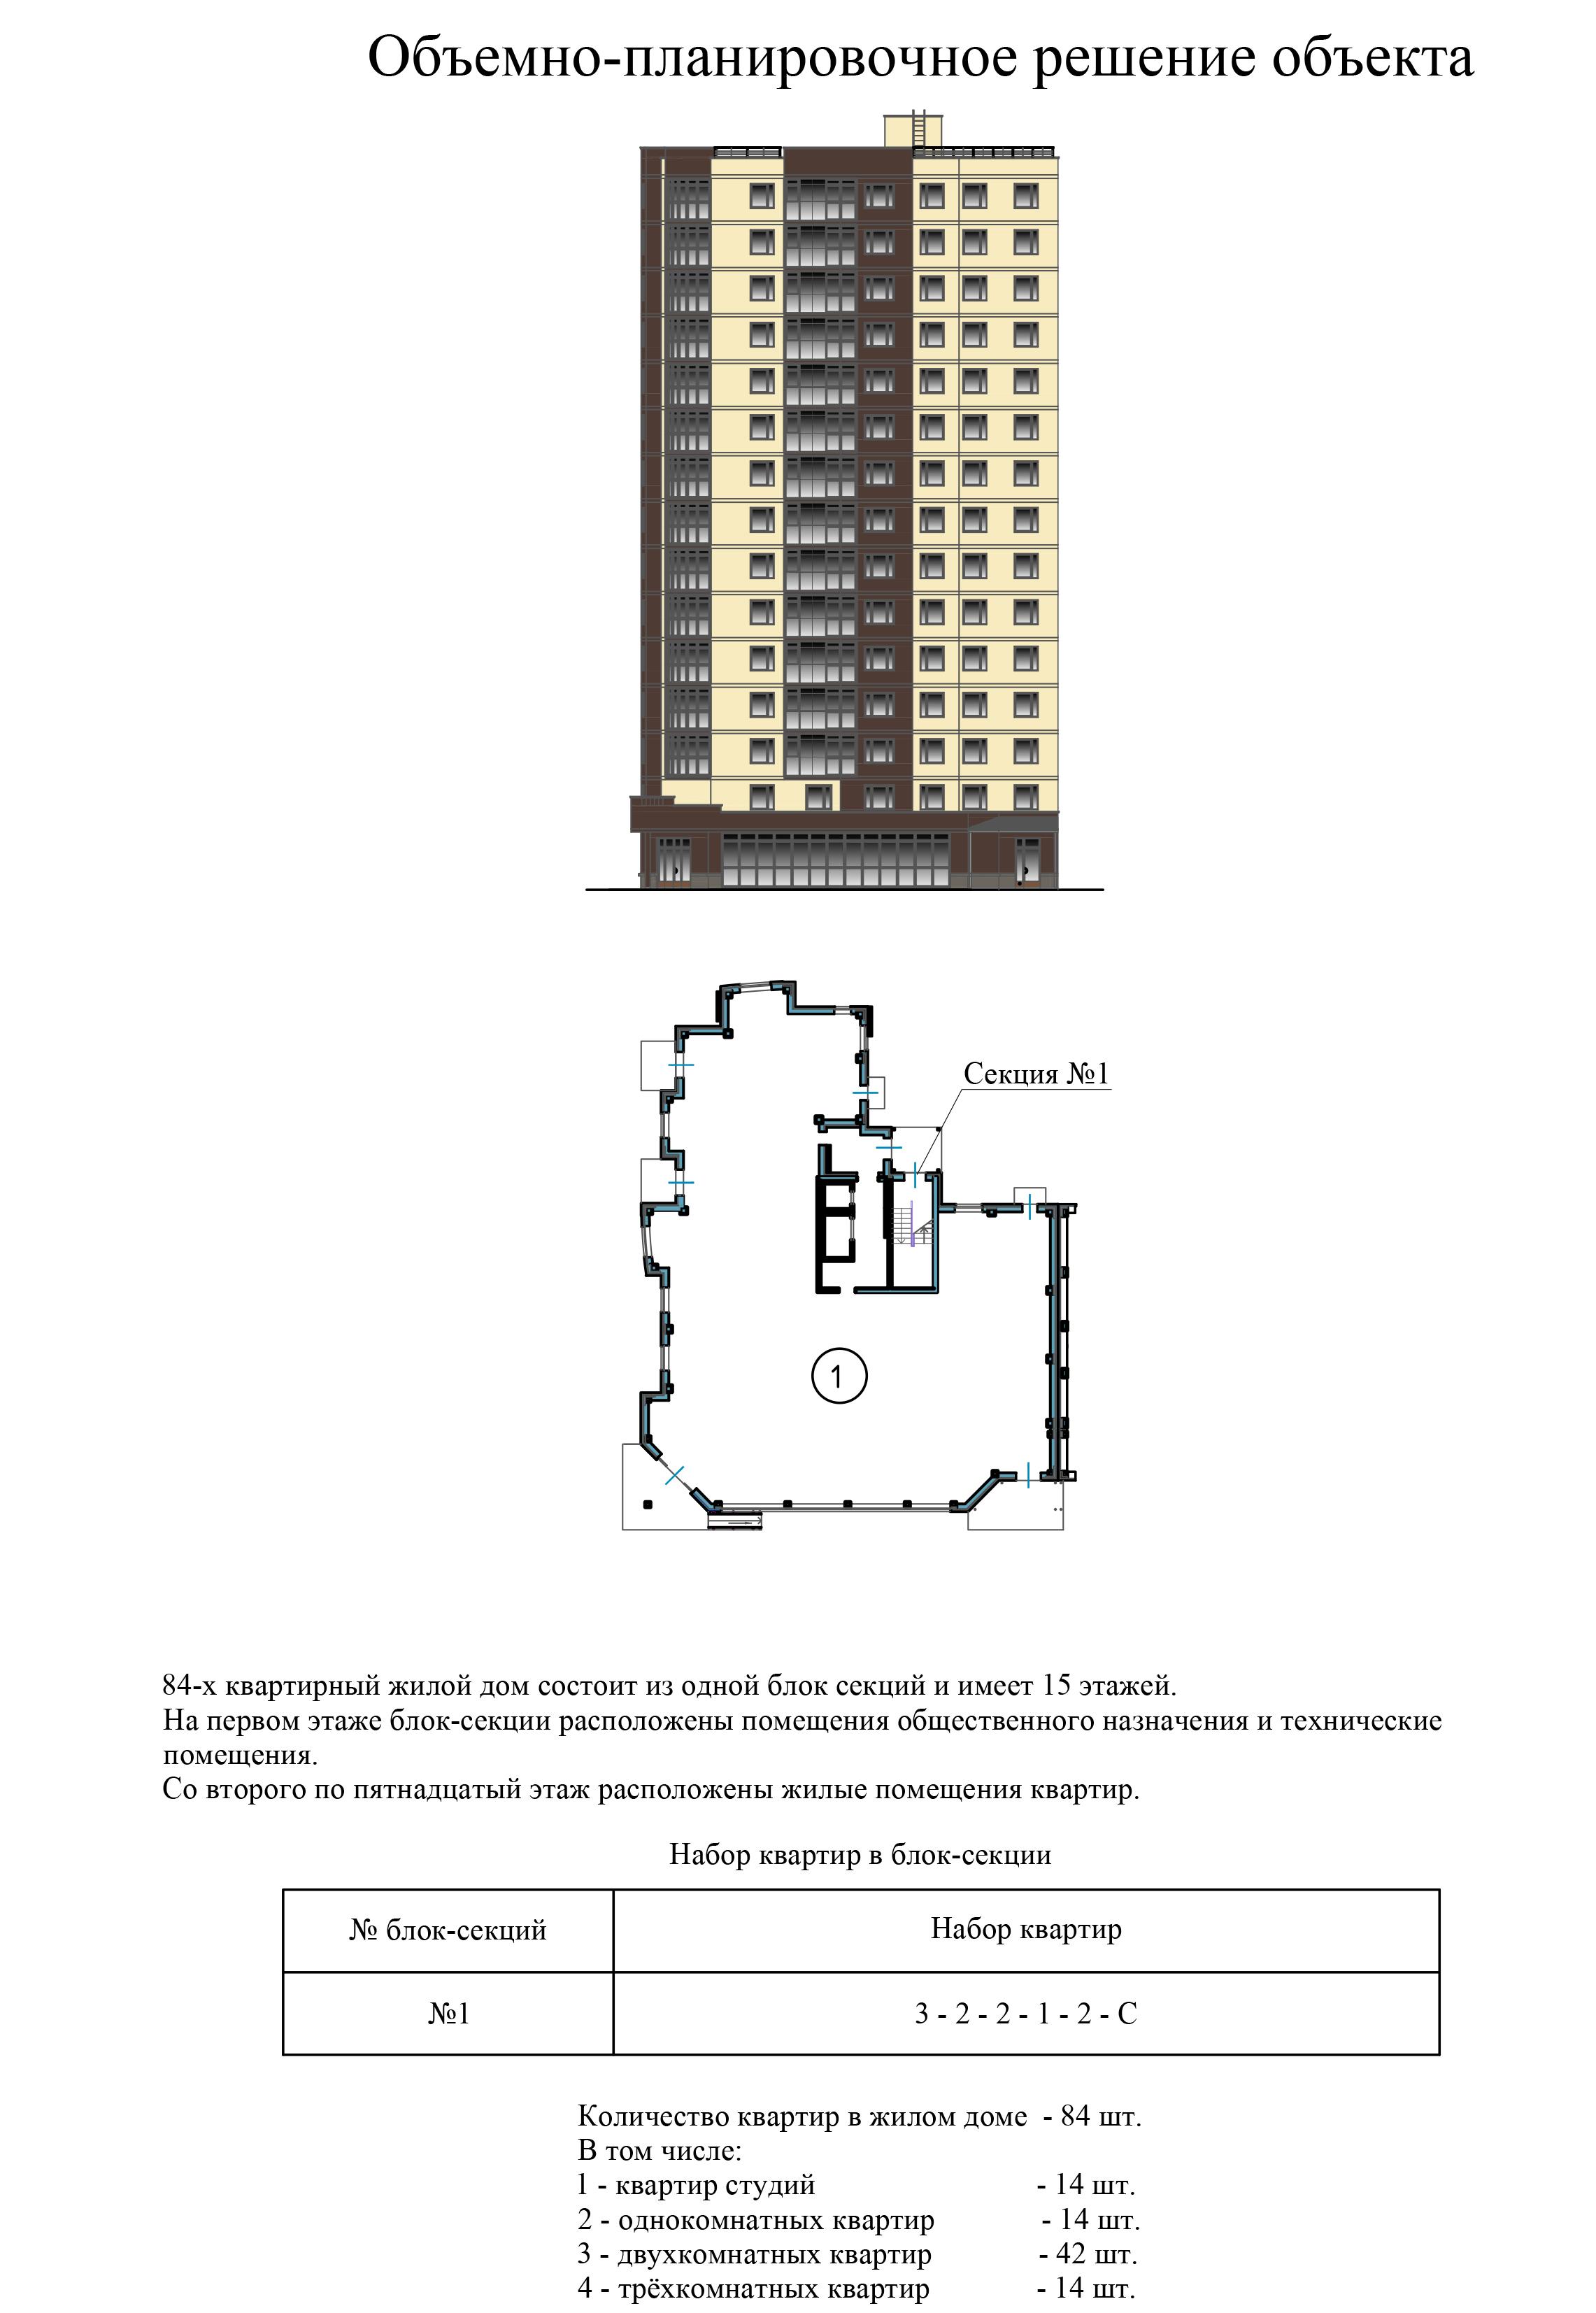 Двухкомнатная квартира - ул.Балтийская, д. 1а, кв. 11, 17, 23, 29, 35, 41